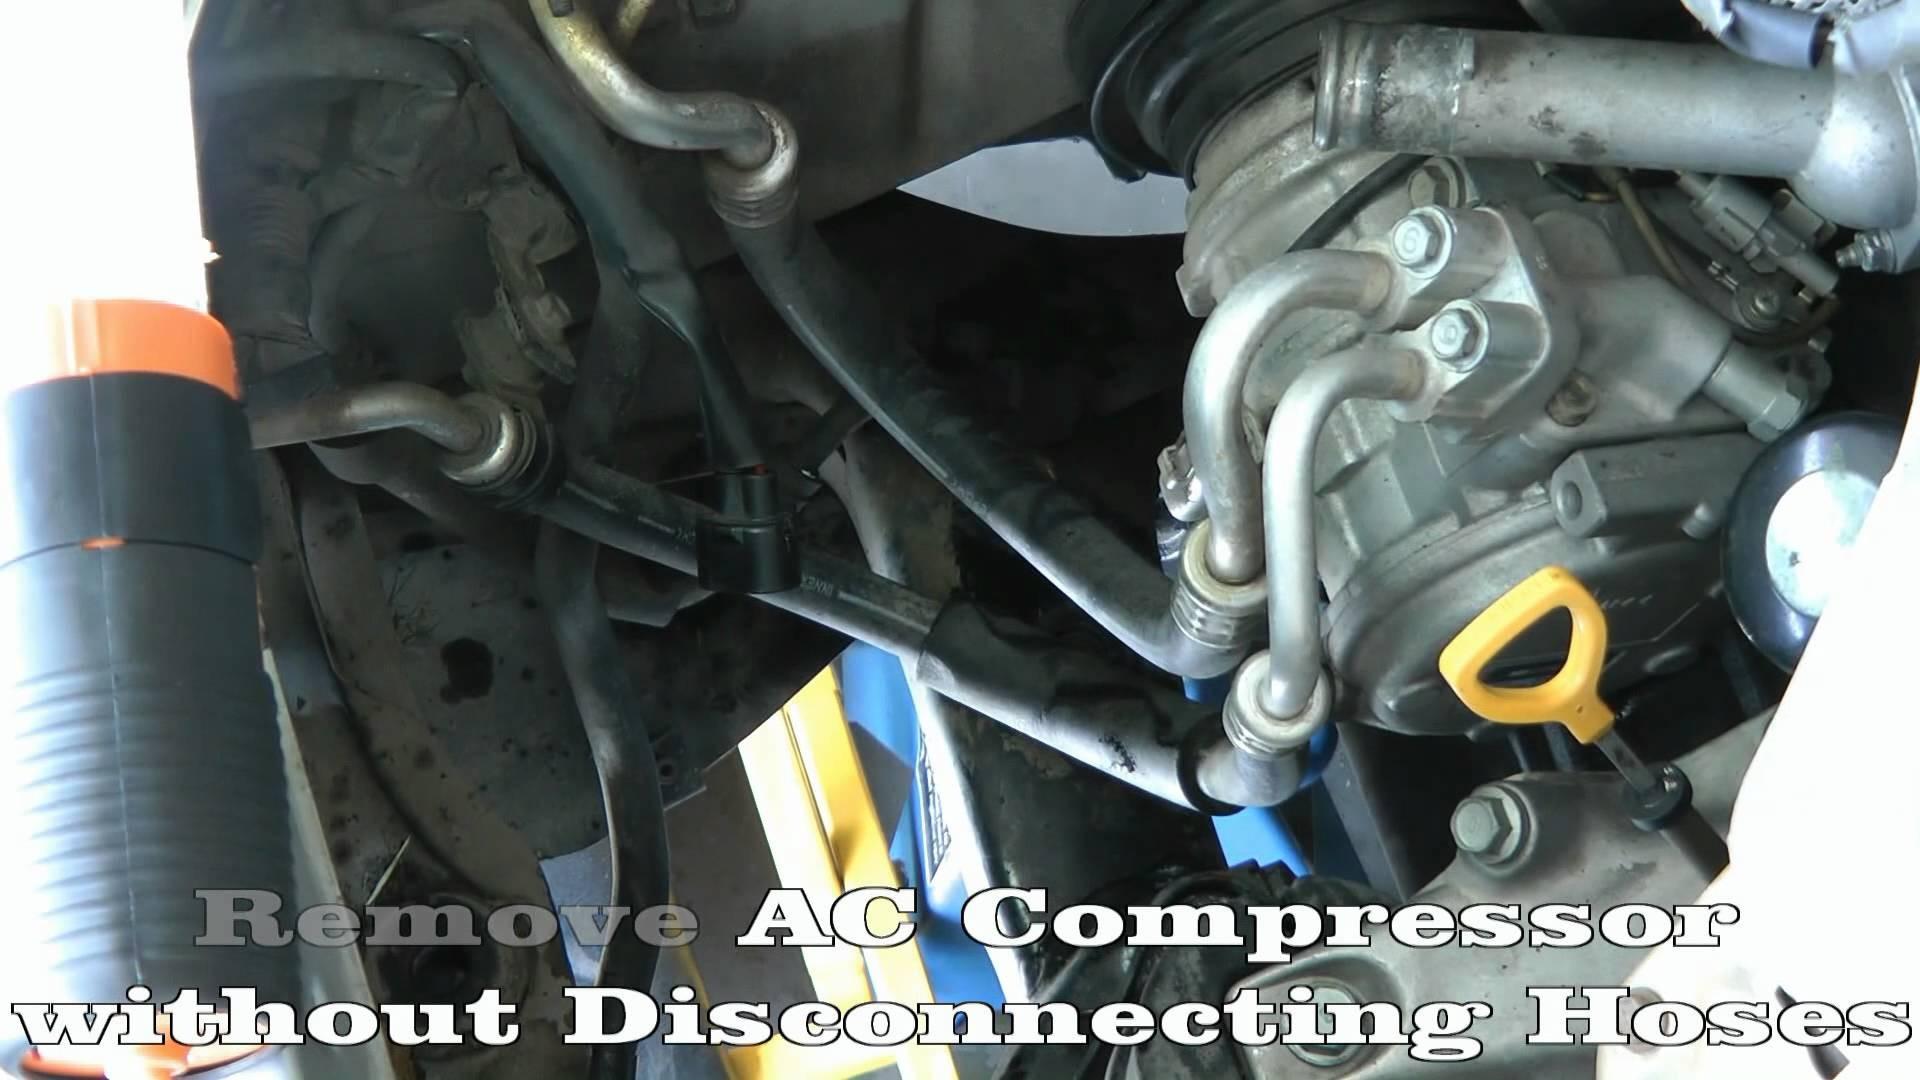 2000 toyota Camry Engine Diagram Part 1 Of 10 Remove Engine & Tranny Rebuild 1994 toyota Camry Of 2000 toyota Camry Engine Diagram